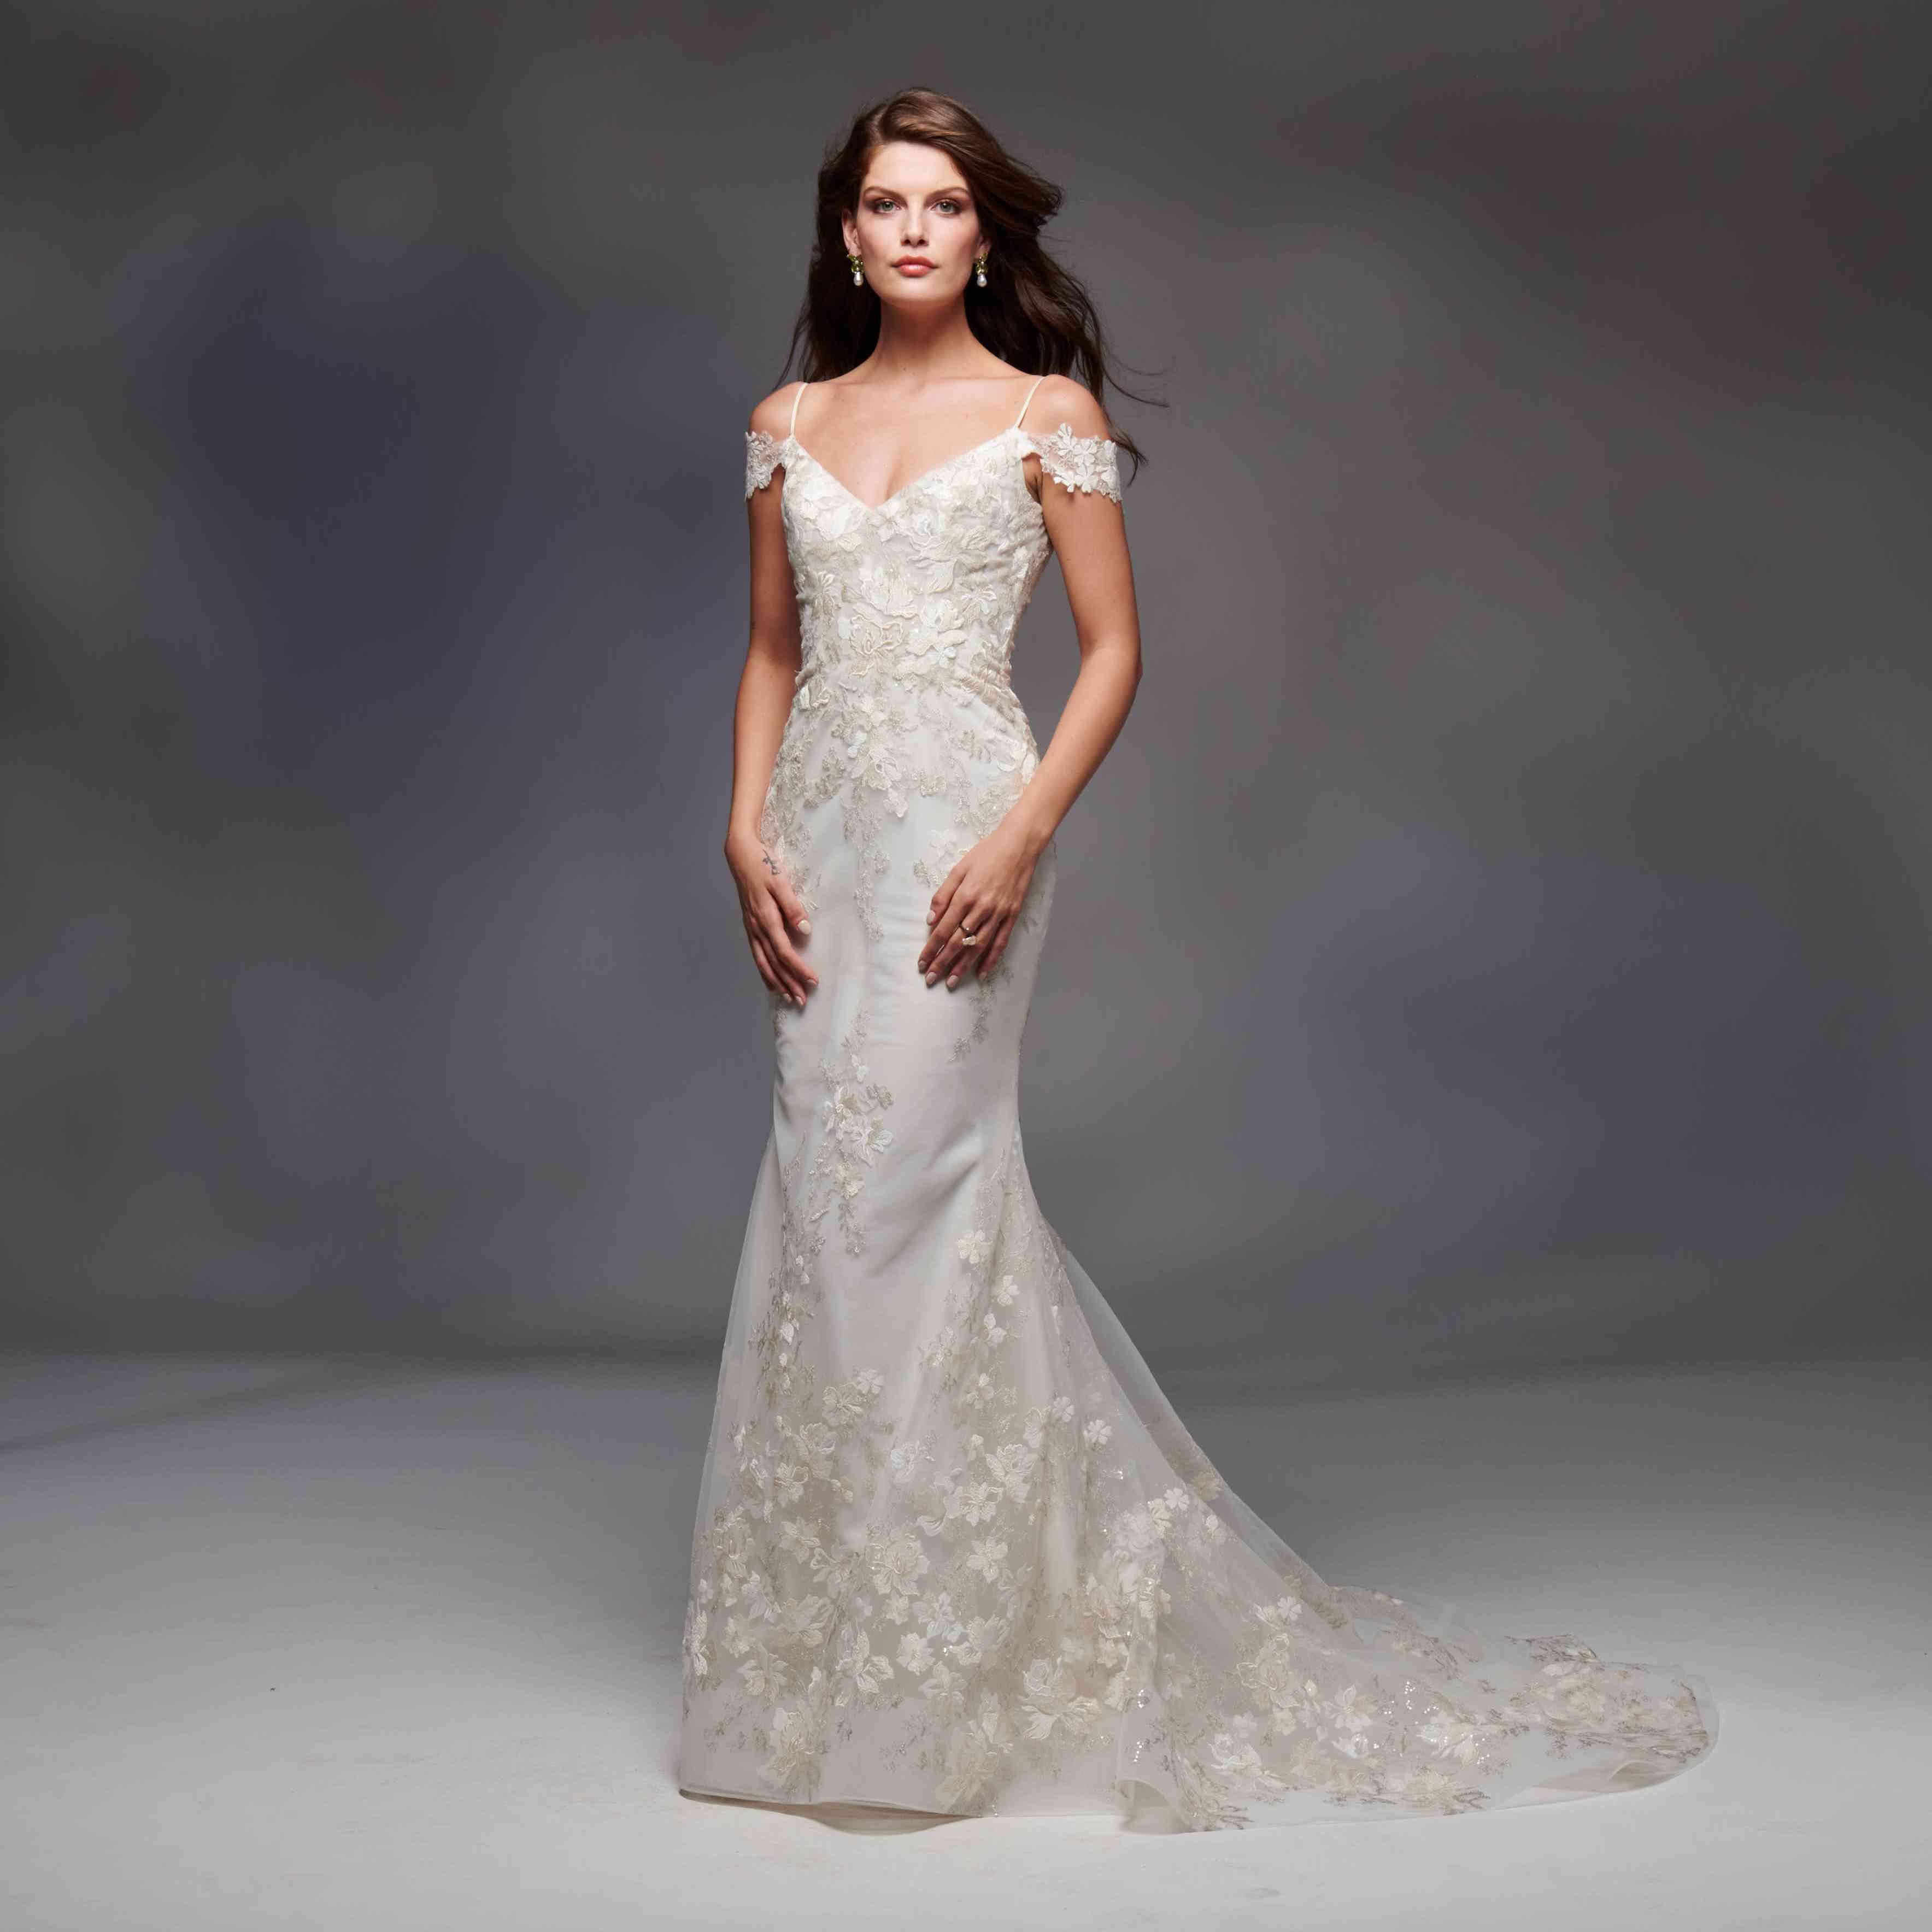 Alexandria off-the-shoulder wedding dress